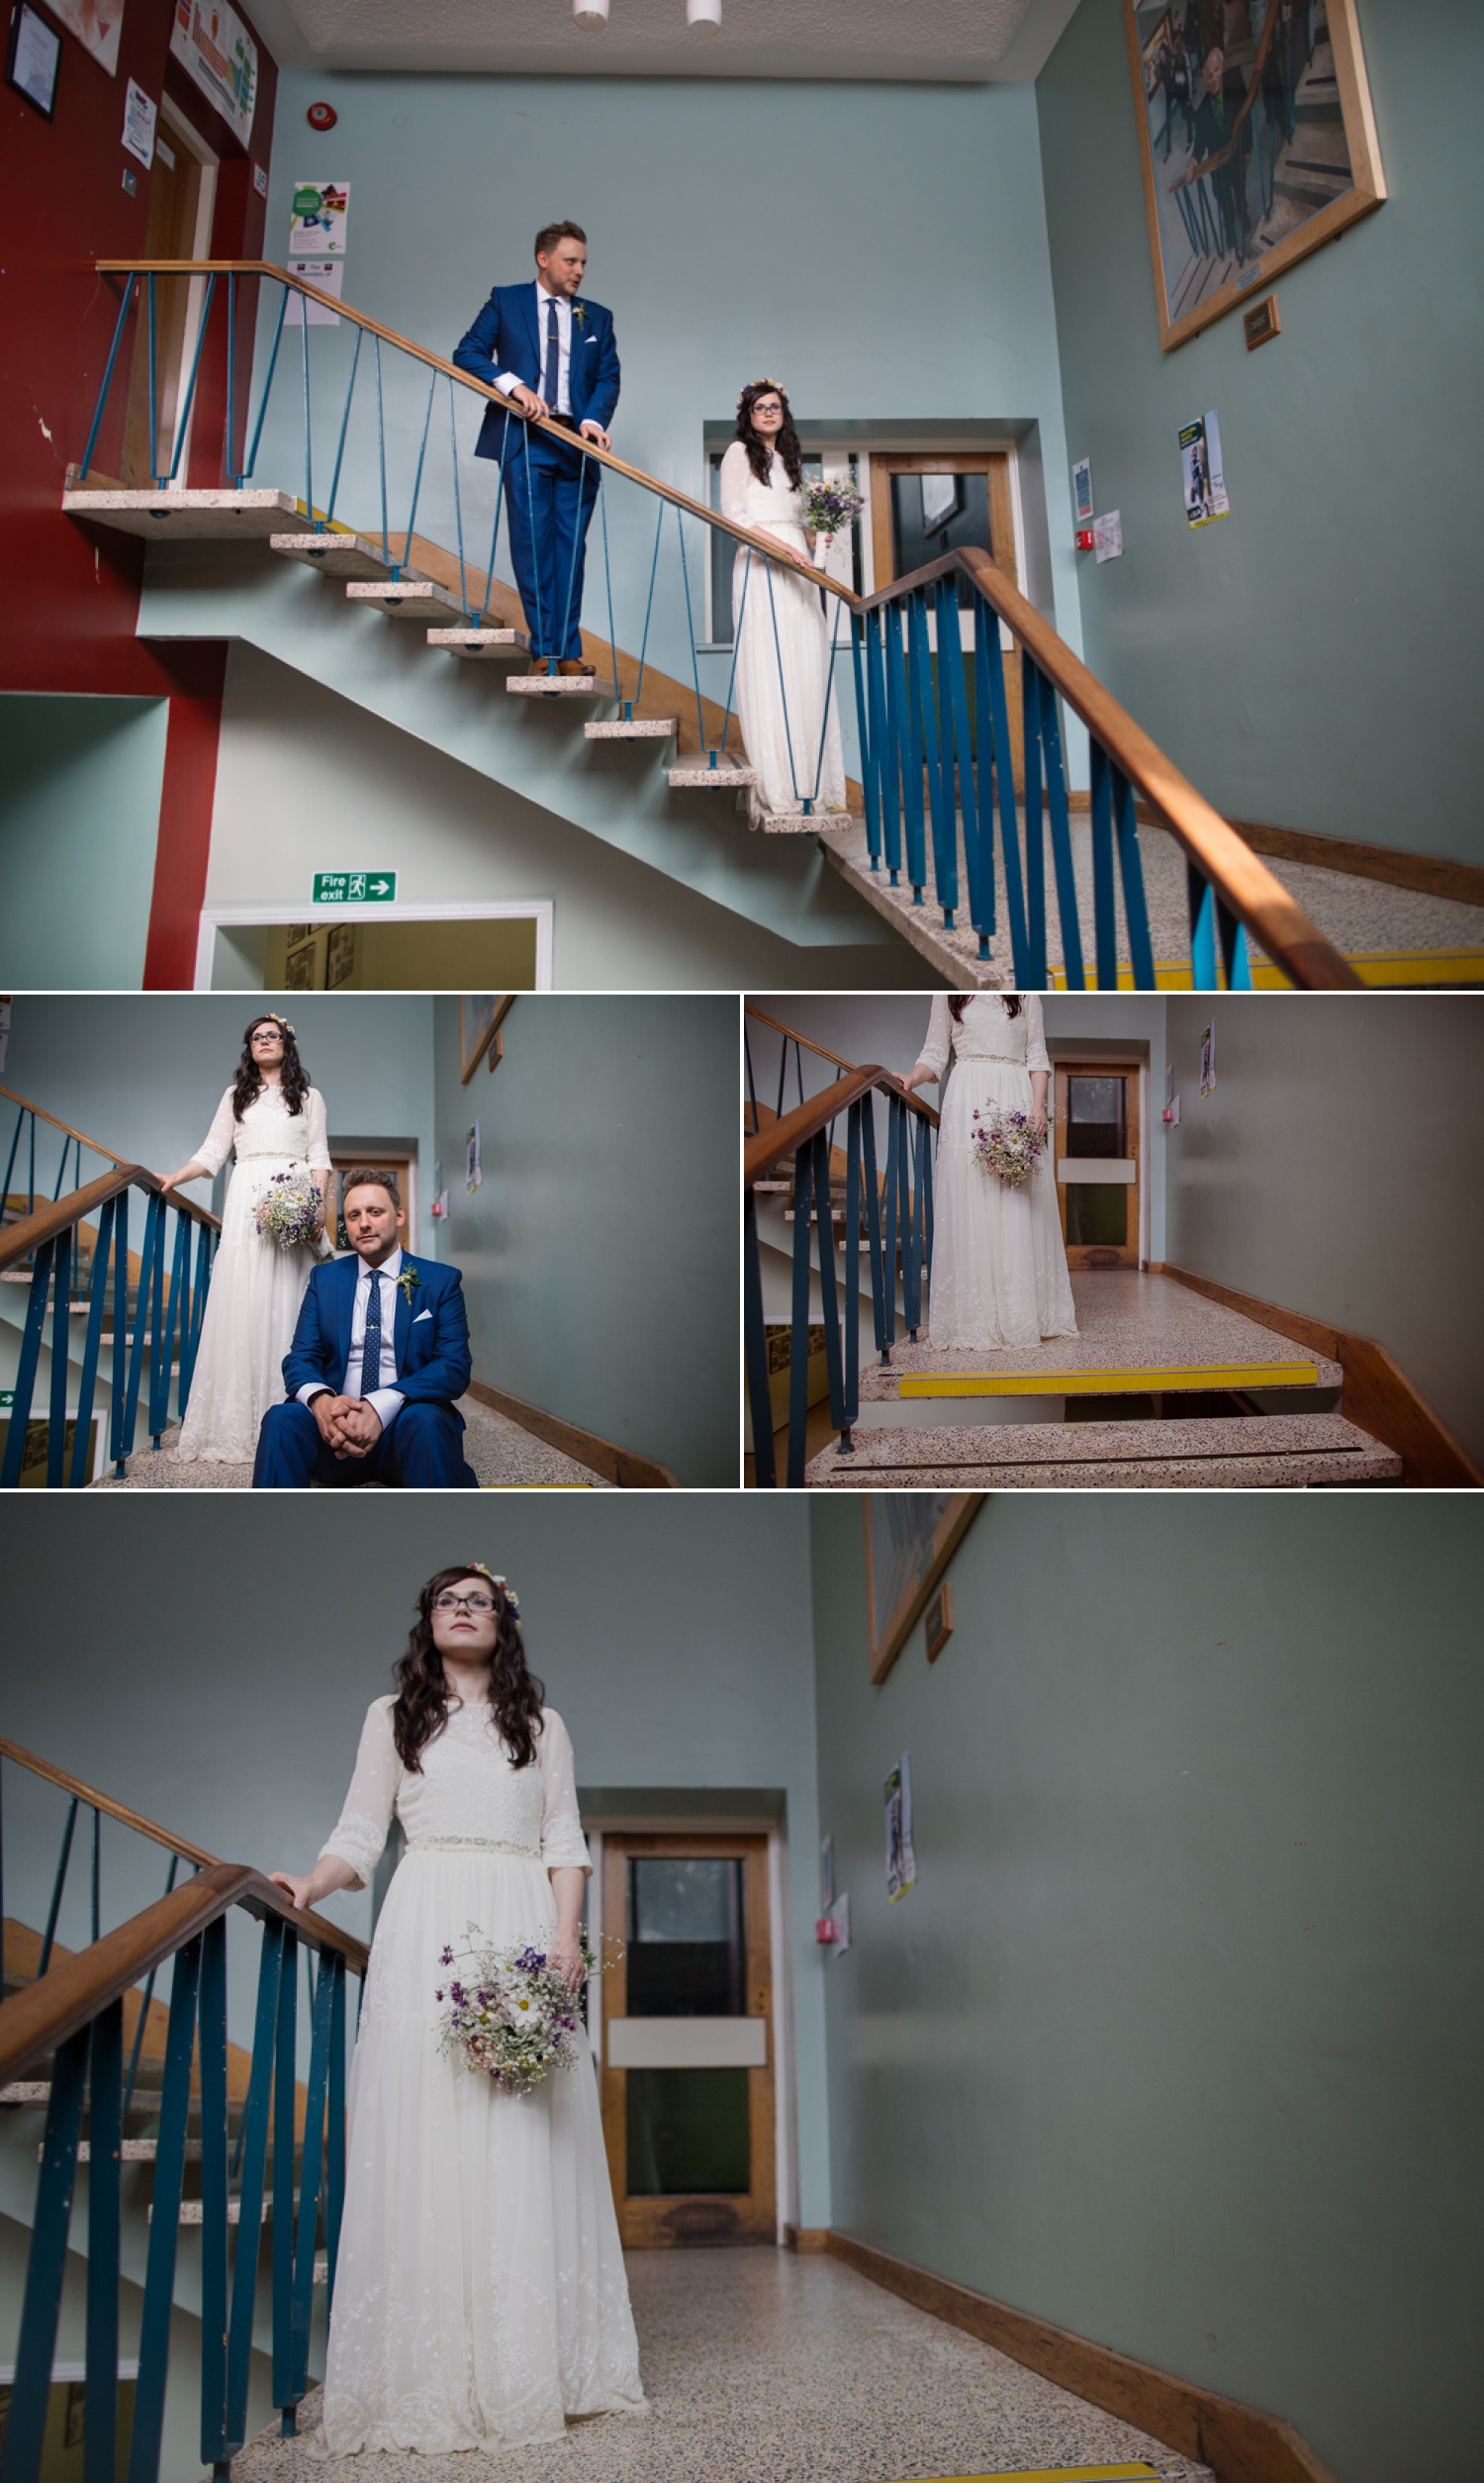 Cheshire Wedding Photographer Elly & Liam_0024